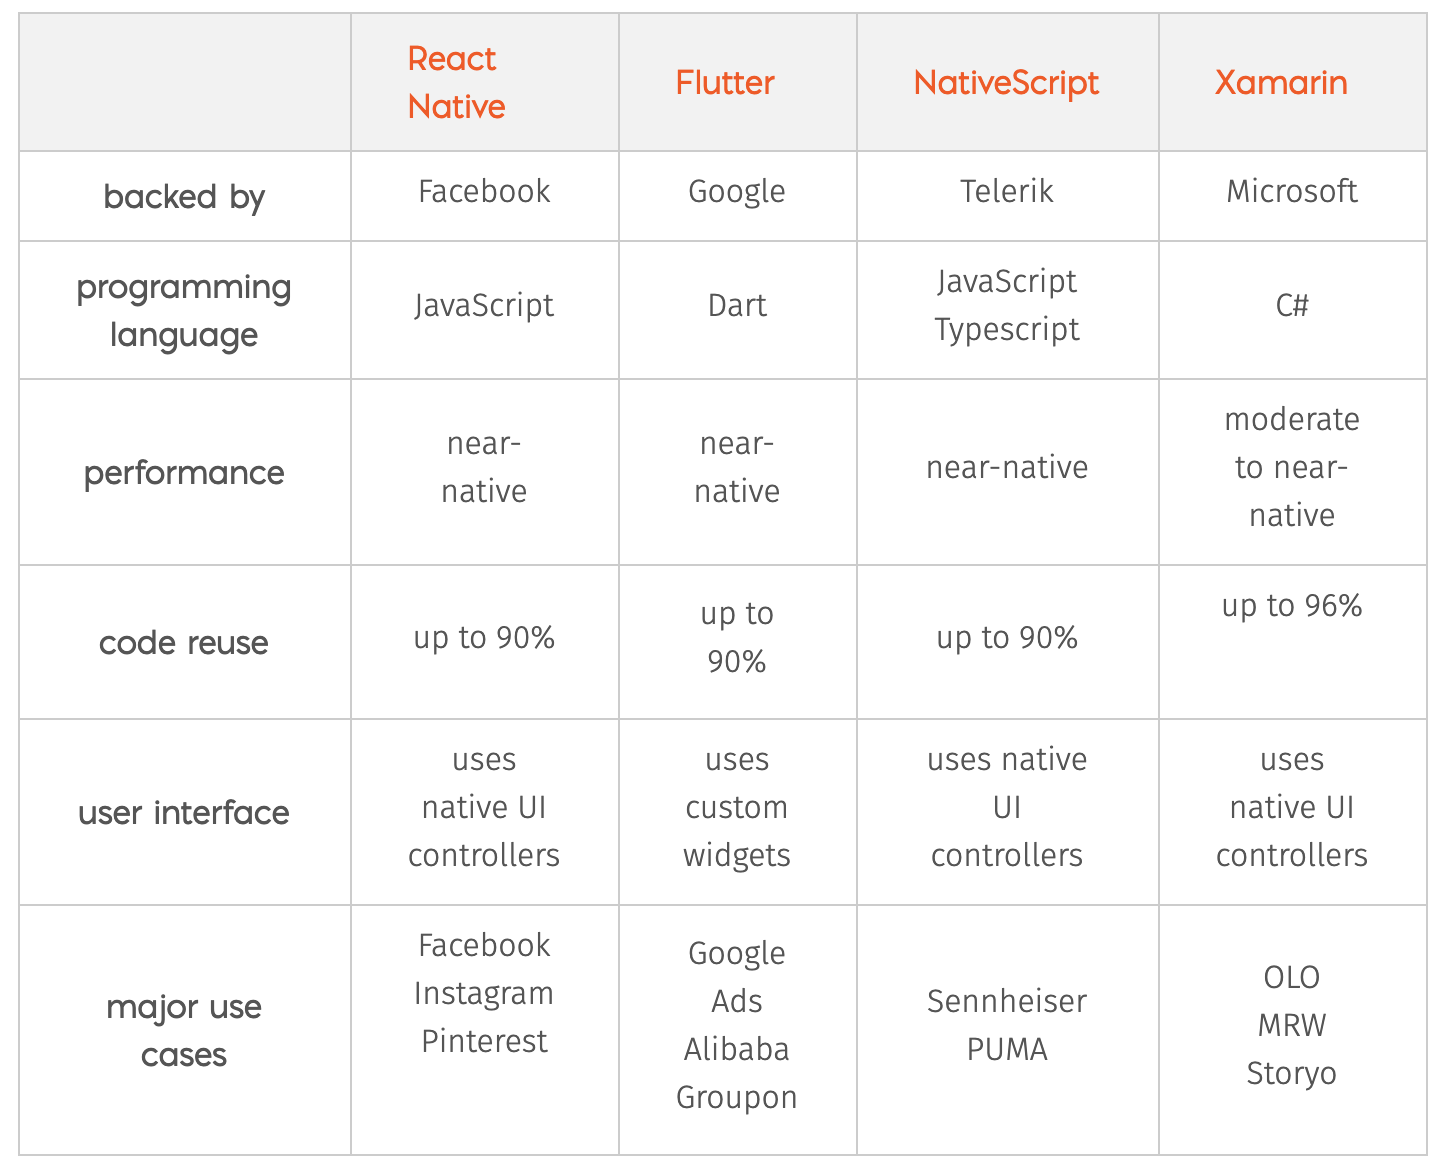 Merixstudio - comparison of software tools